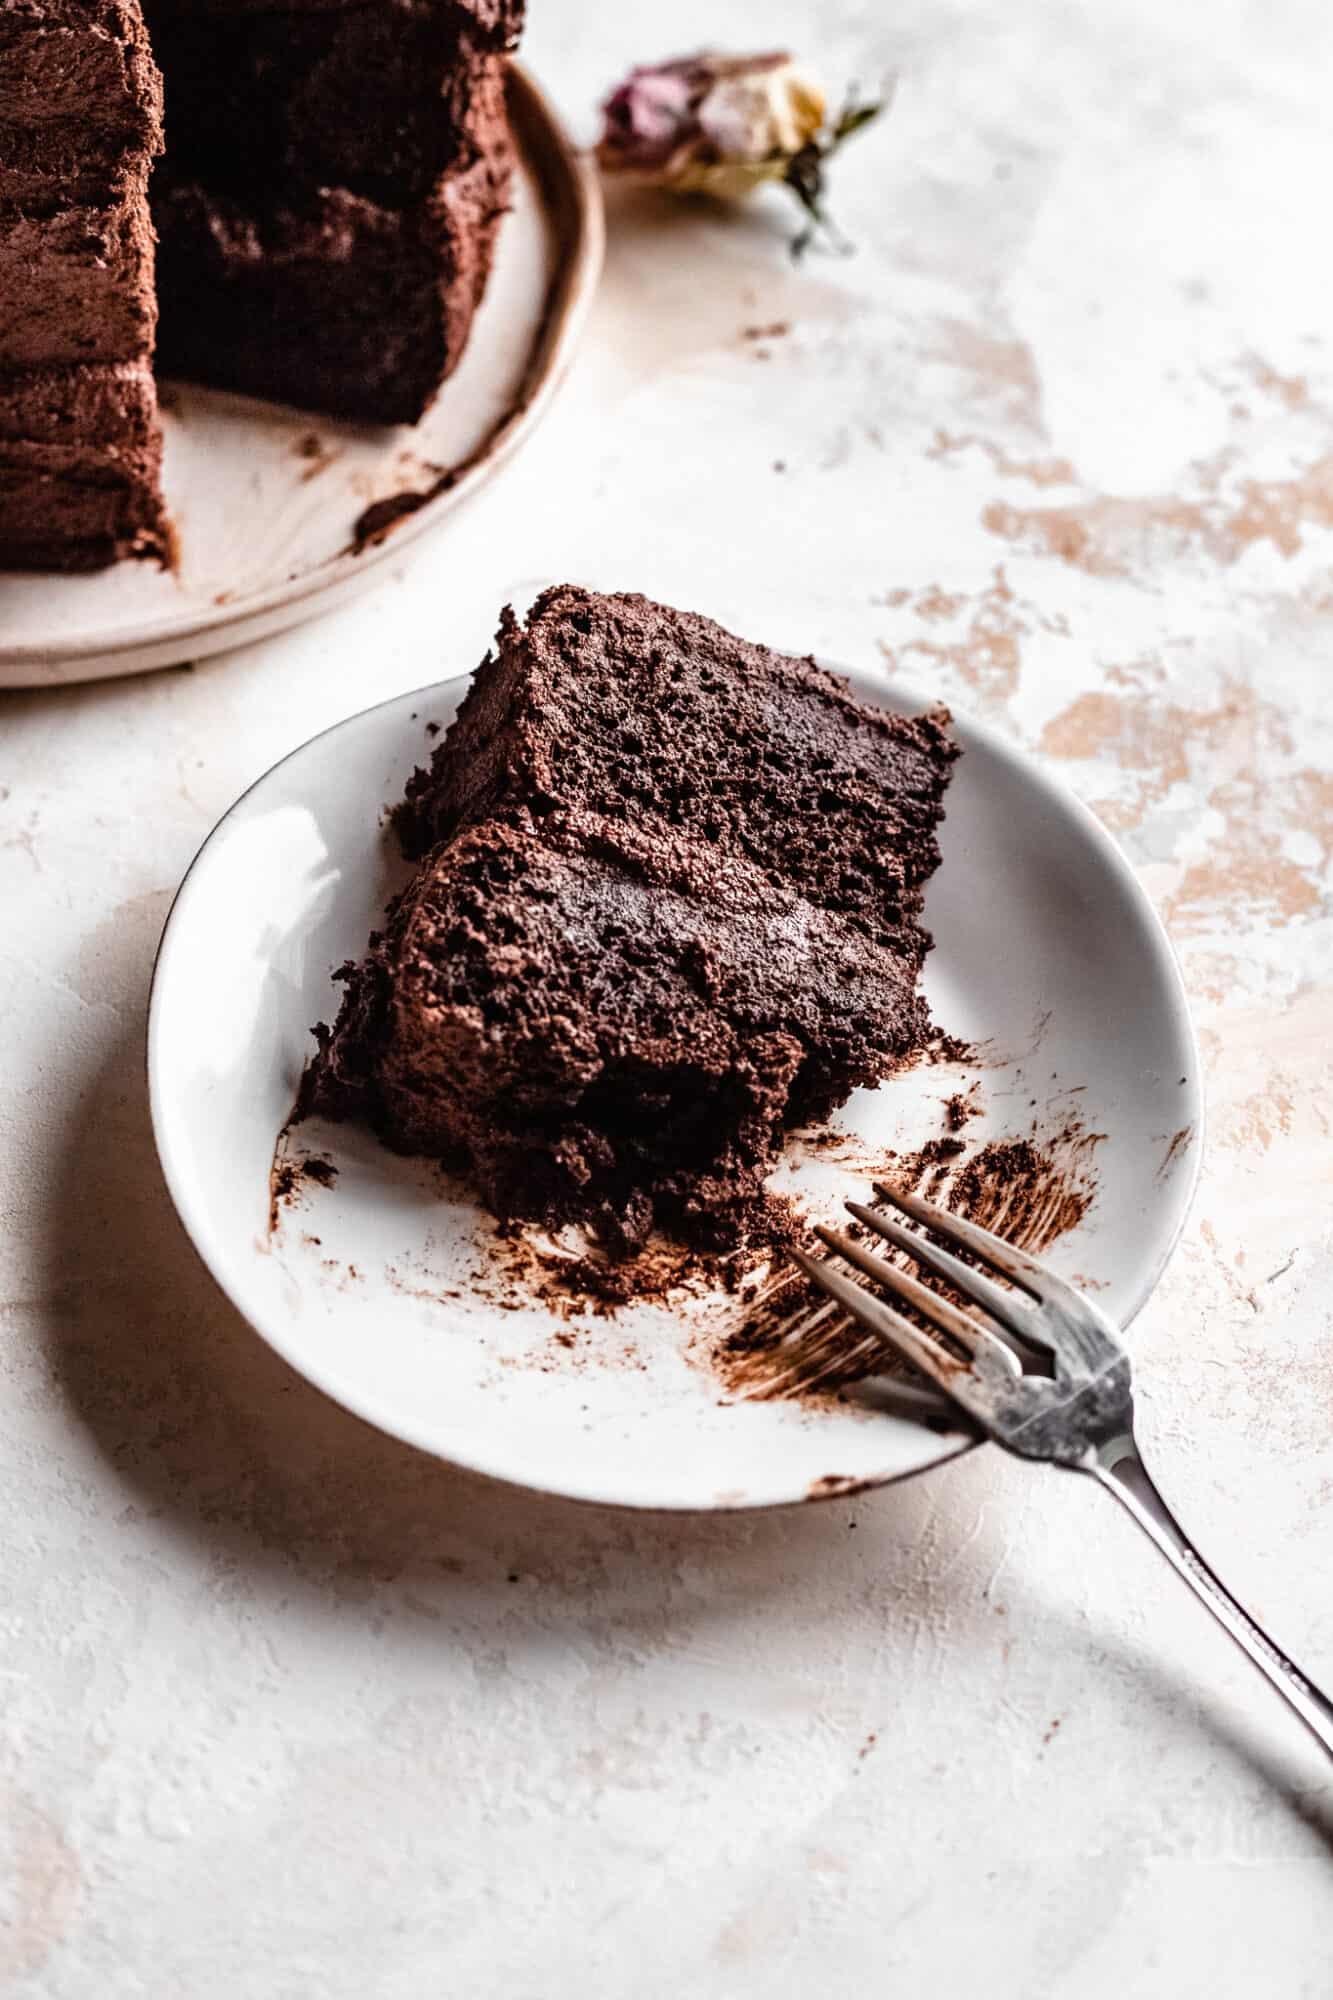 eaten vegan chocolate cake slice